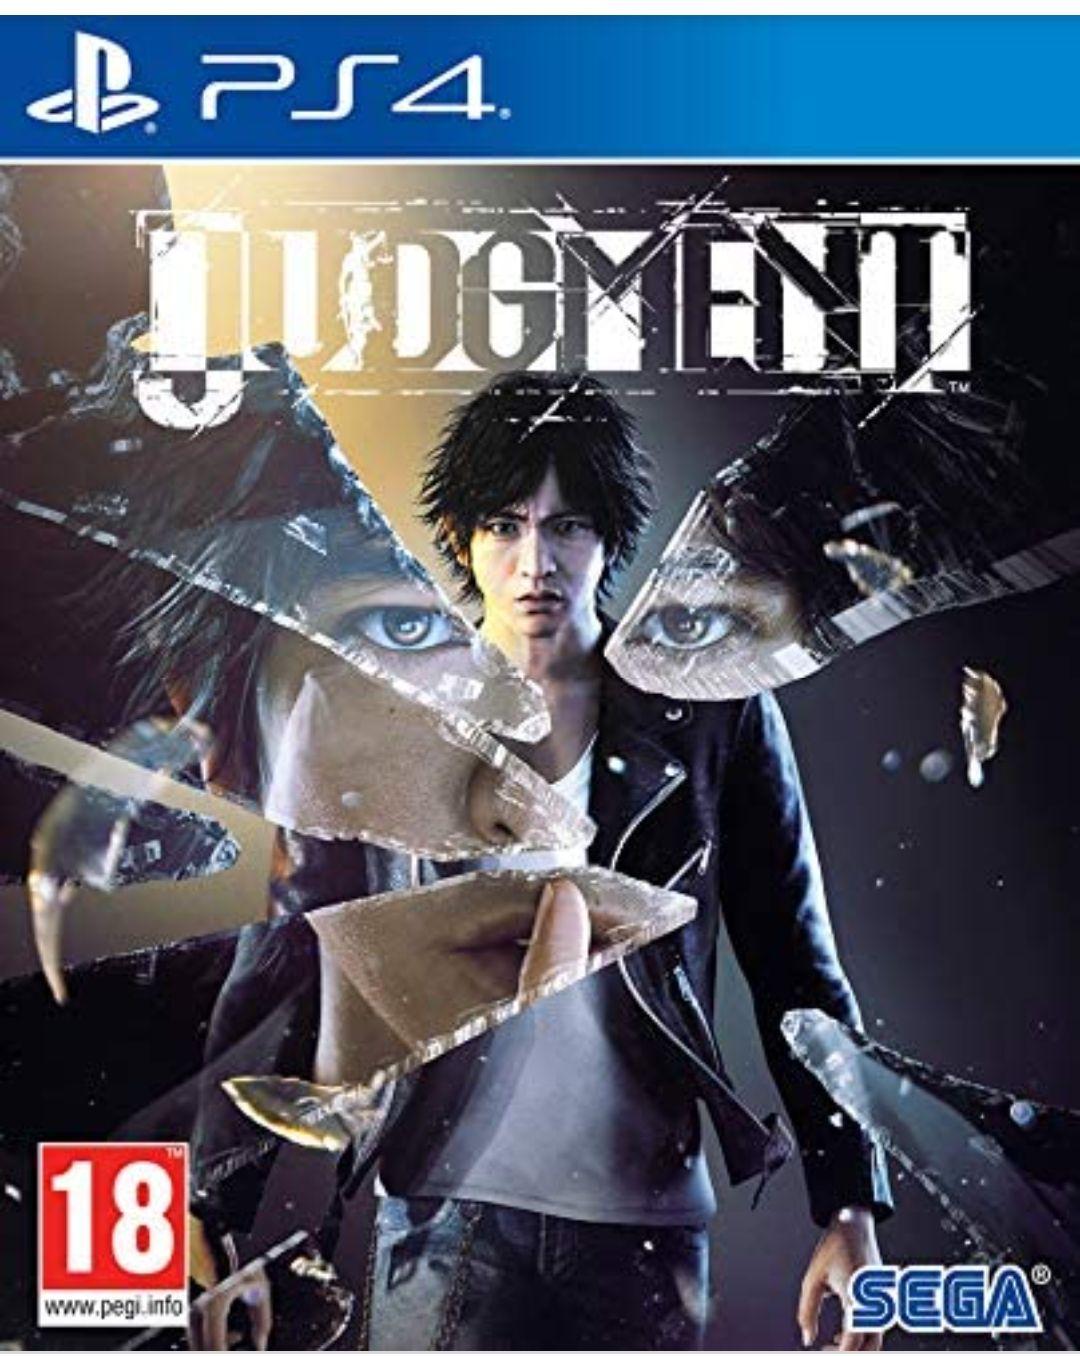 Judgment PS4 [PSN Juego Digital]